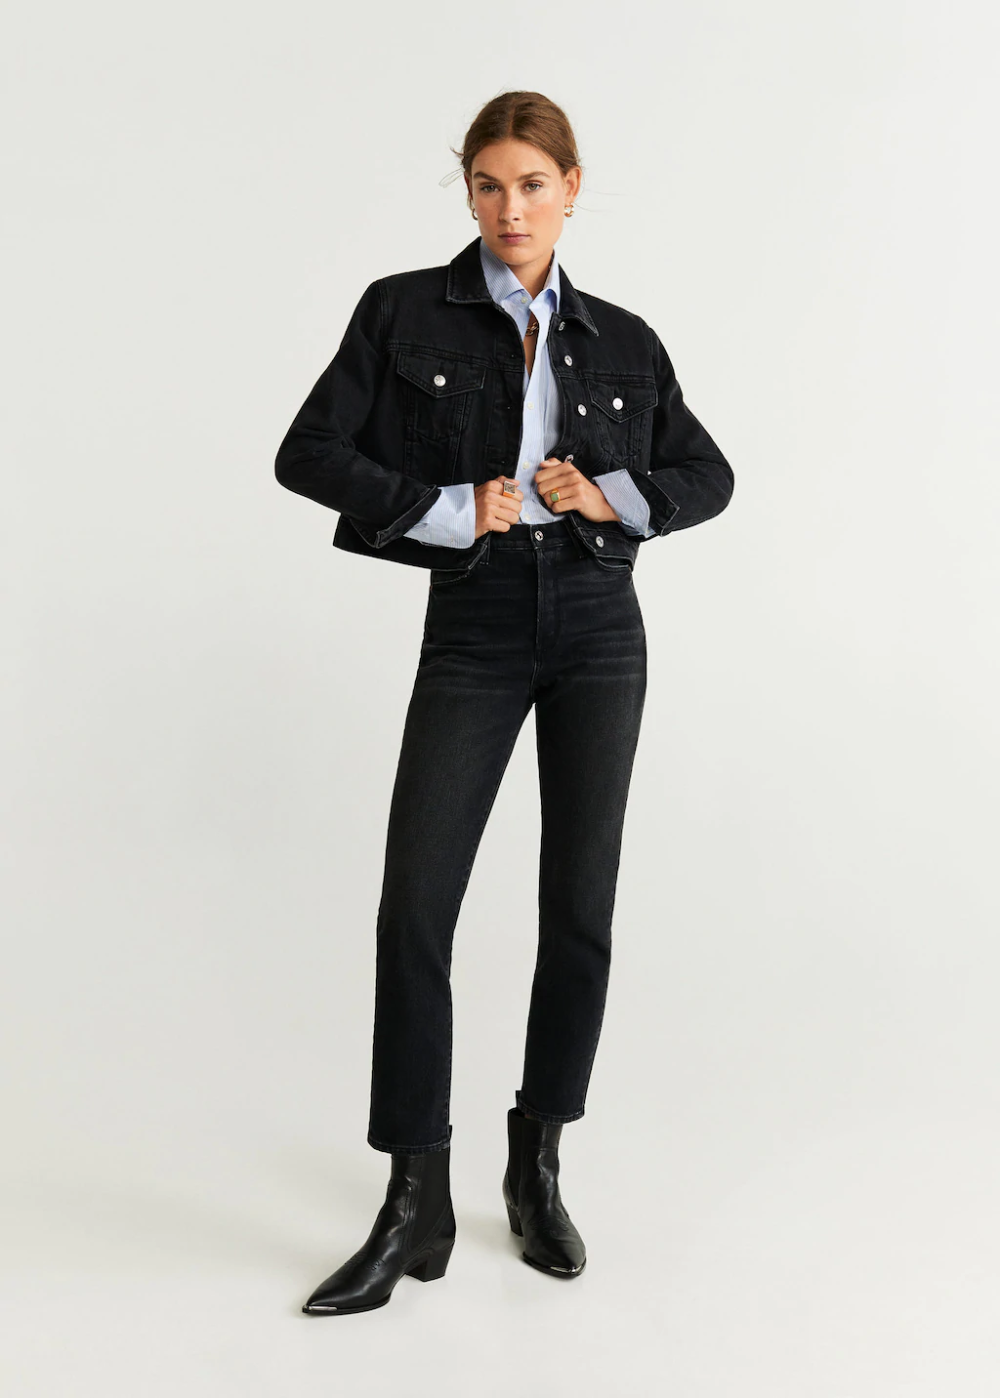 Jeans High Waist Slim Women Mango United Kingdom 2020 Denim Fashion Yuksek Bel Skinny